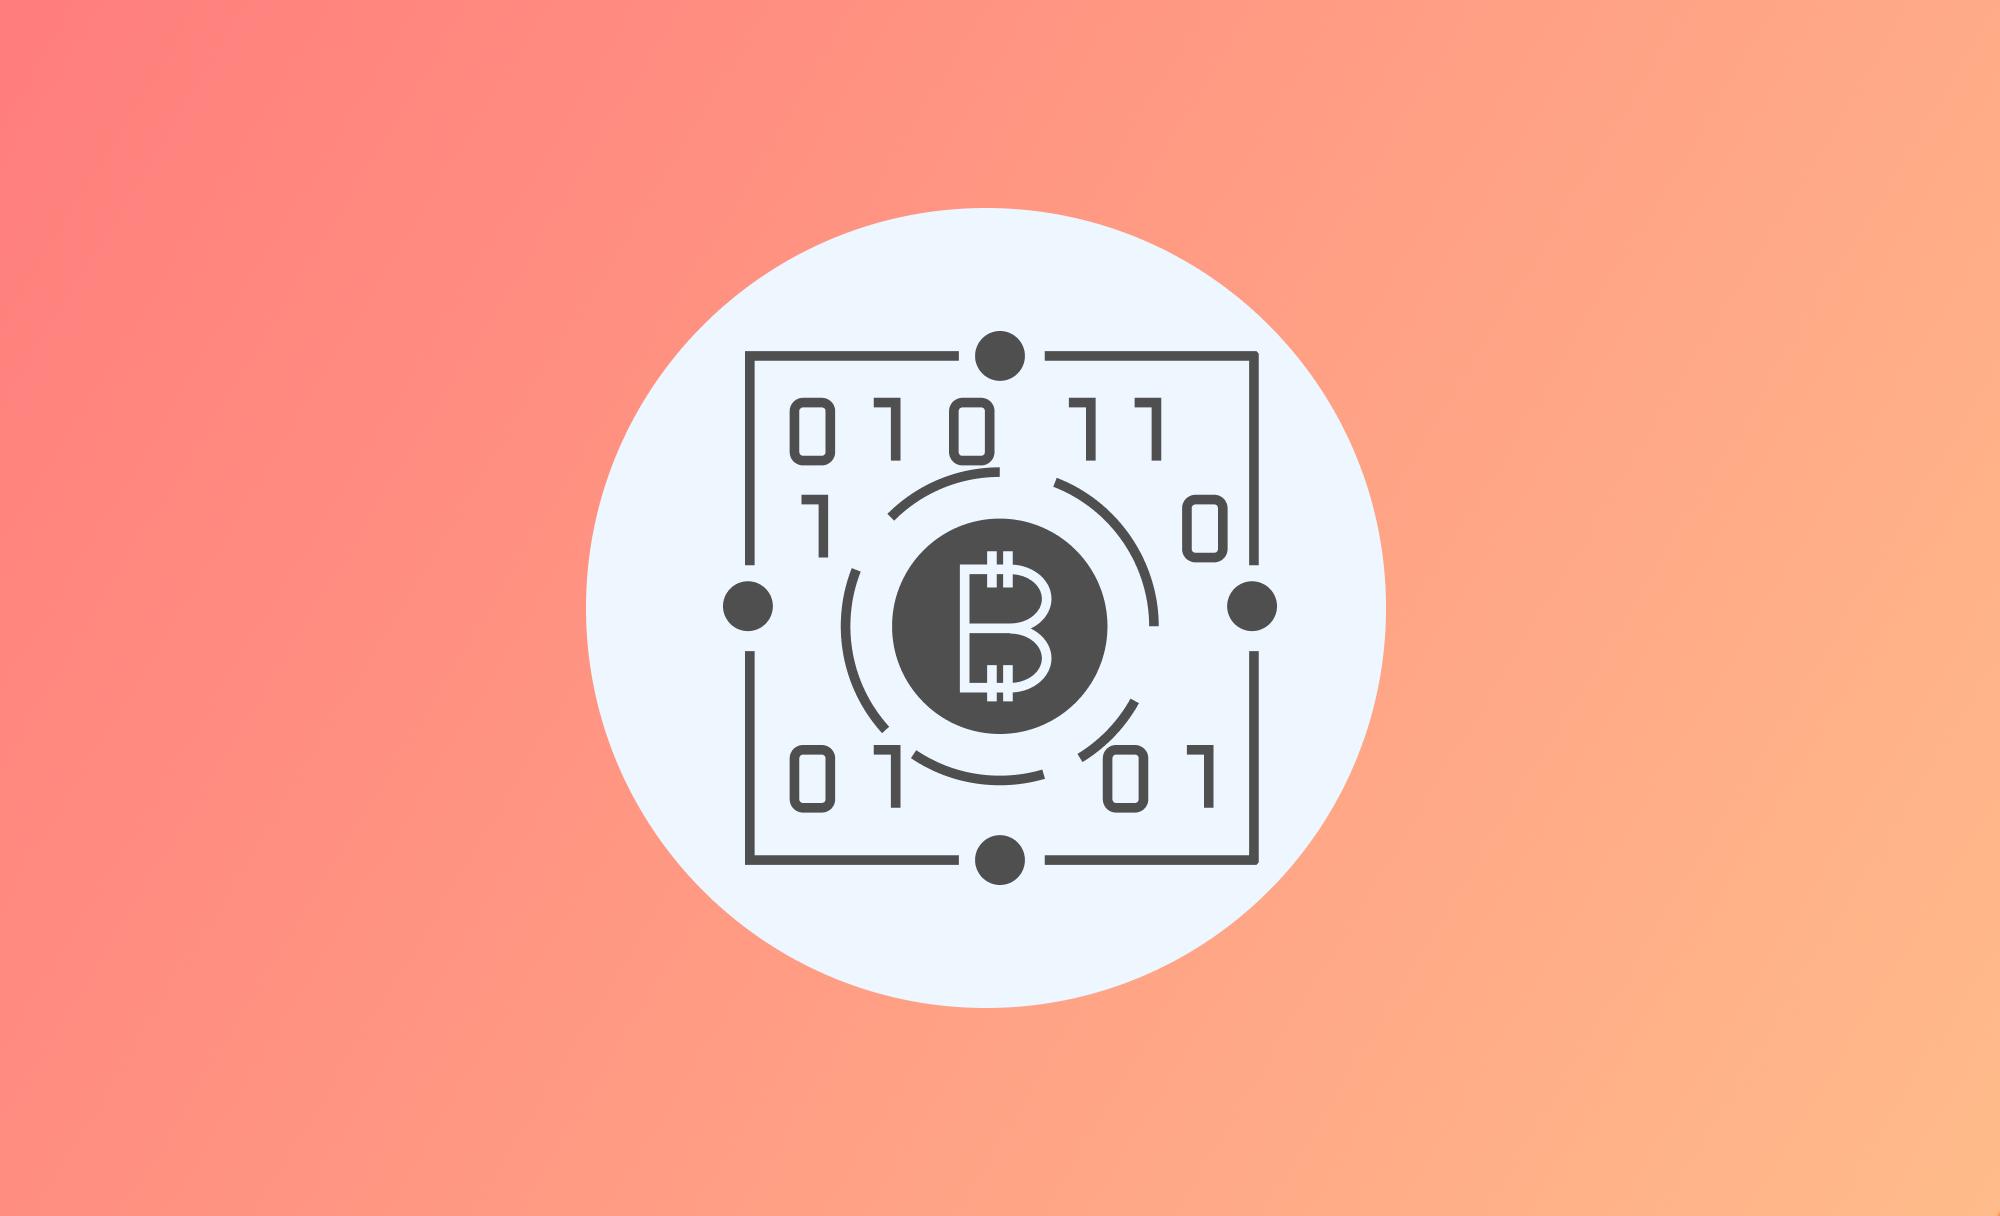 Bitcoin's P2P Network